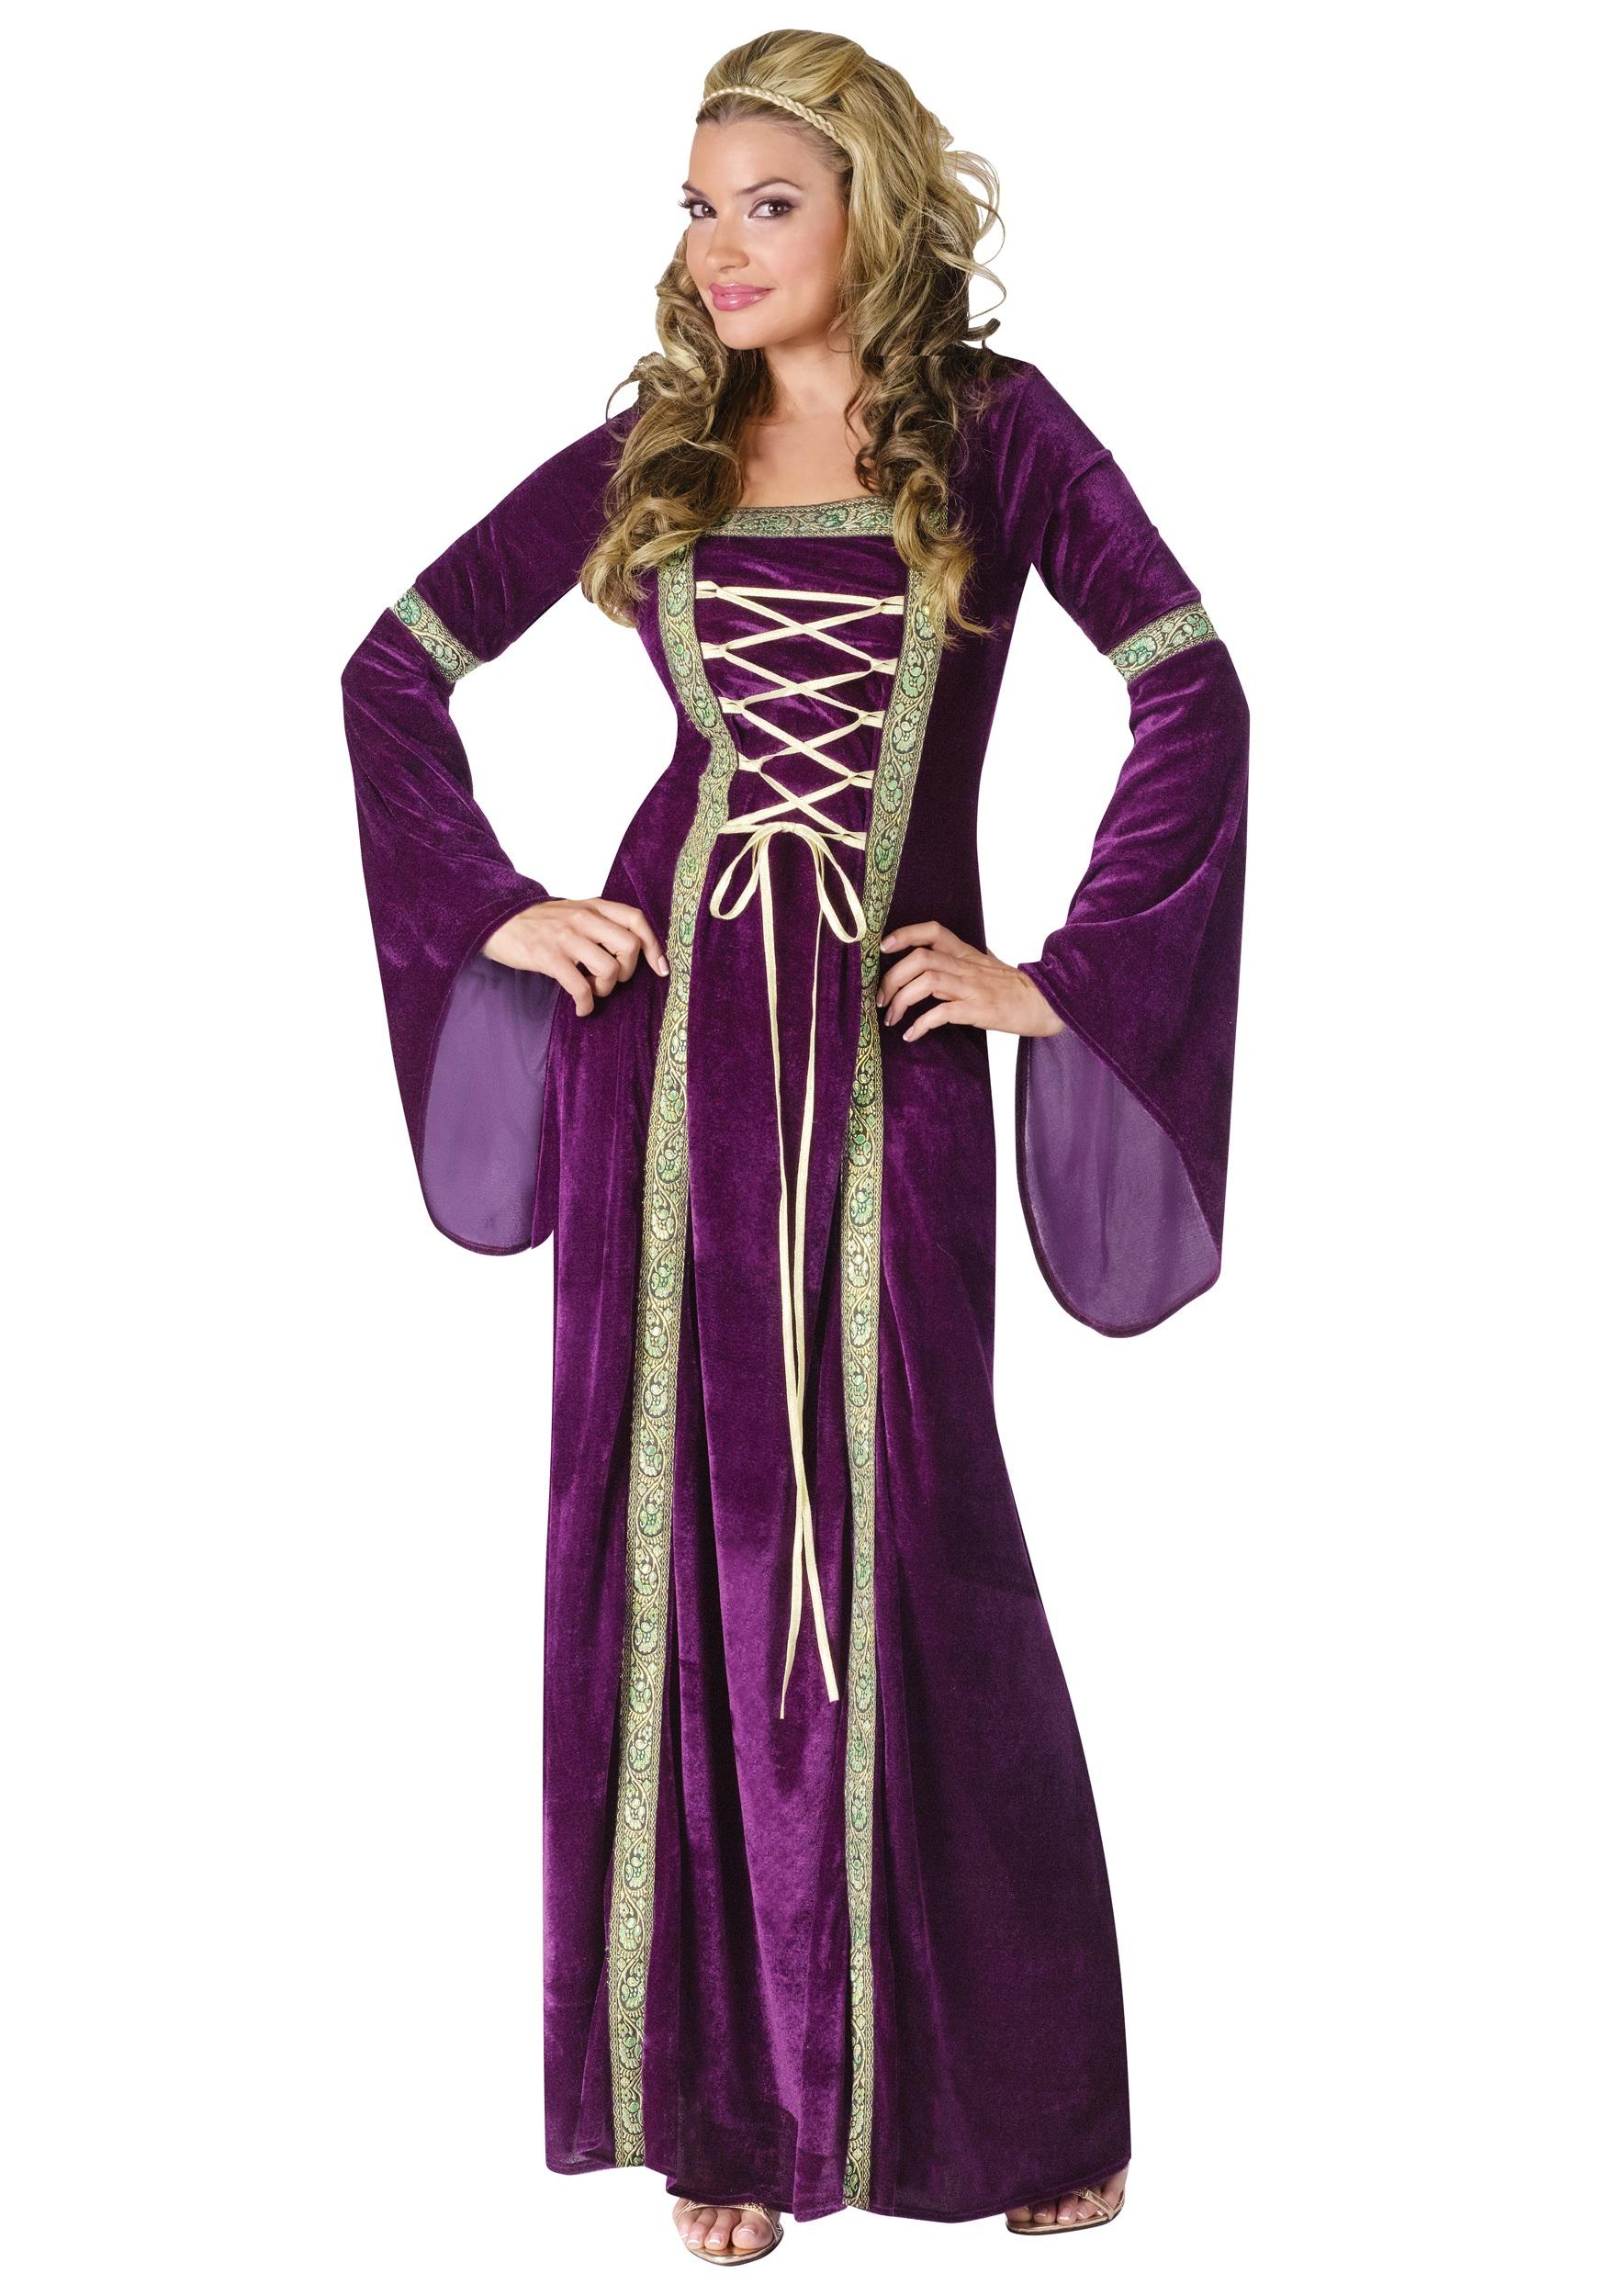 renaissance-lady-costume (1).jpg